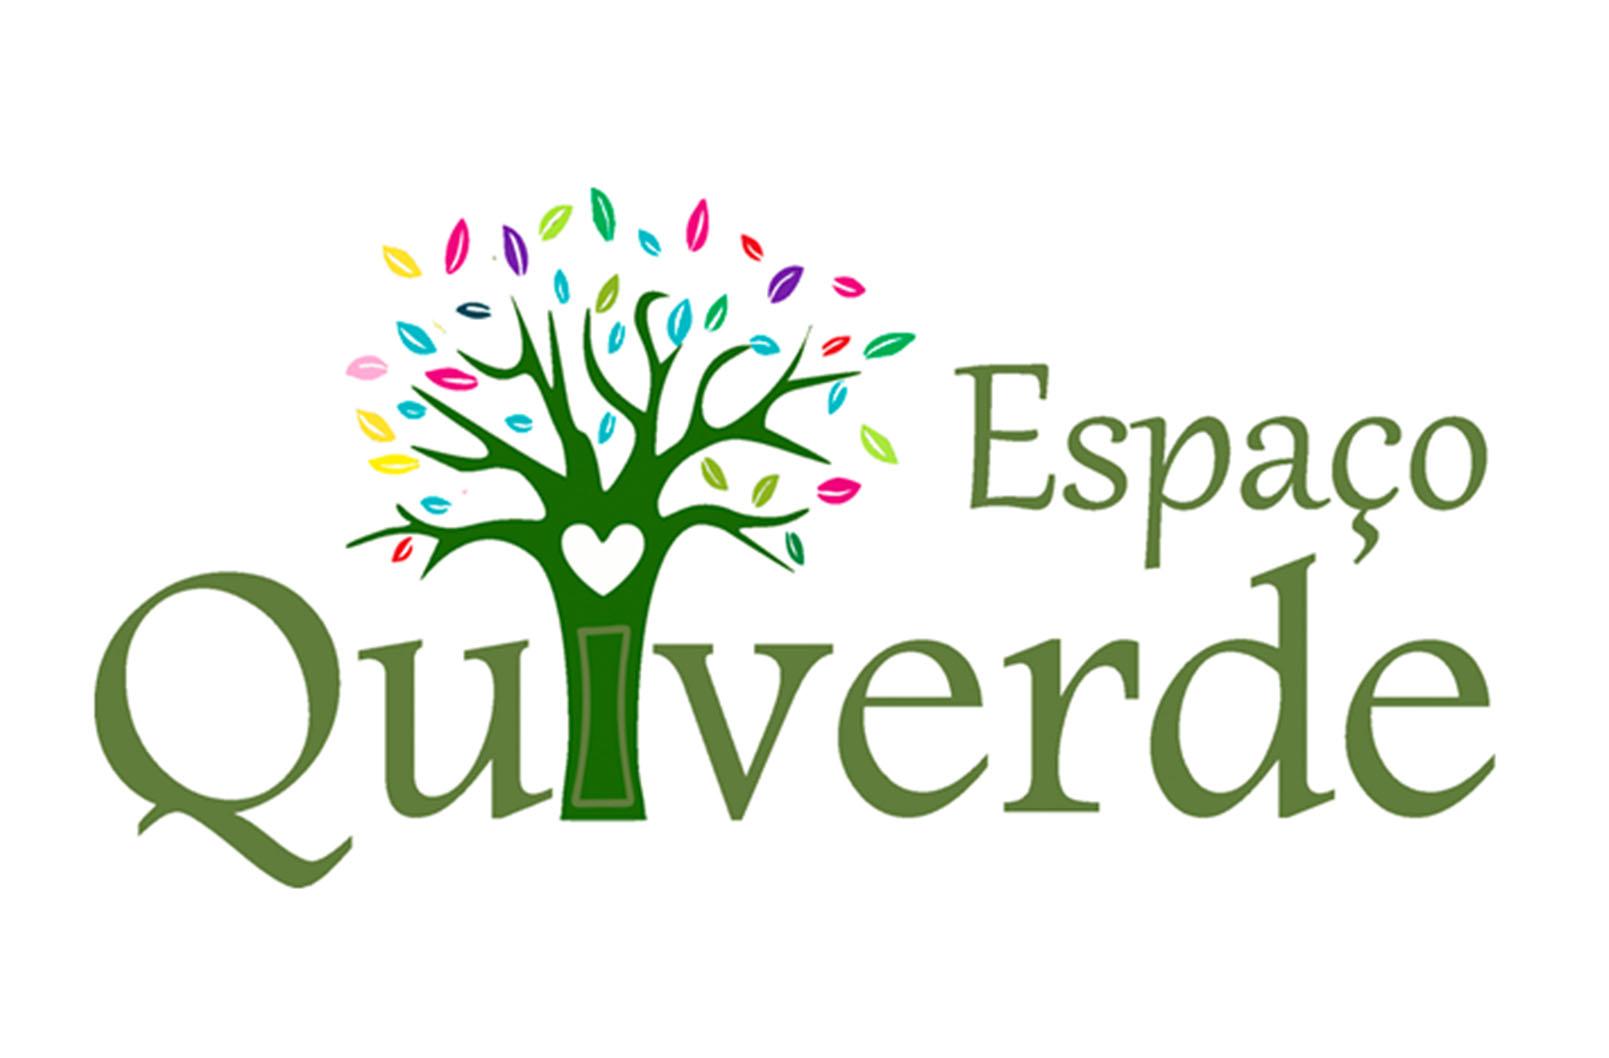 quiverde